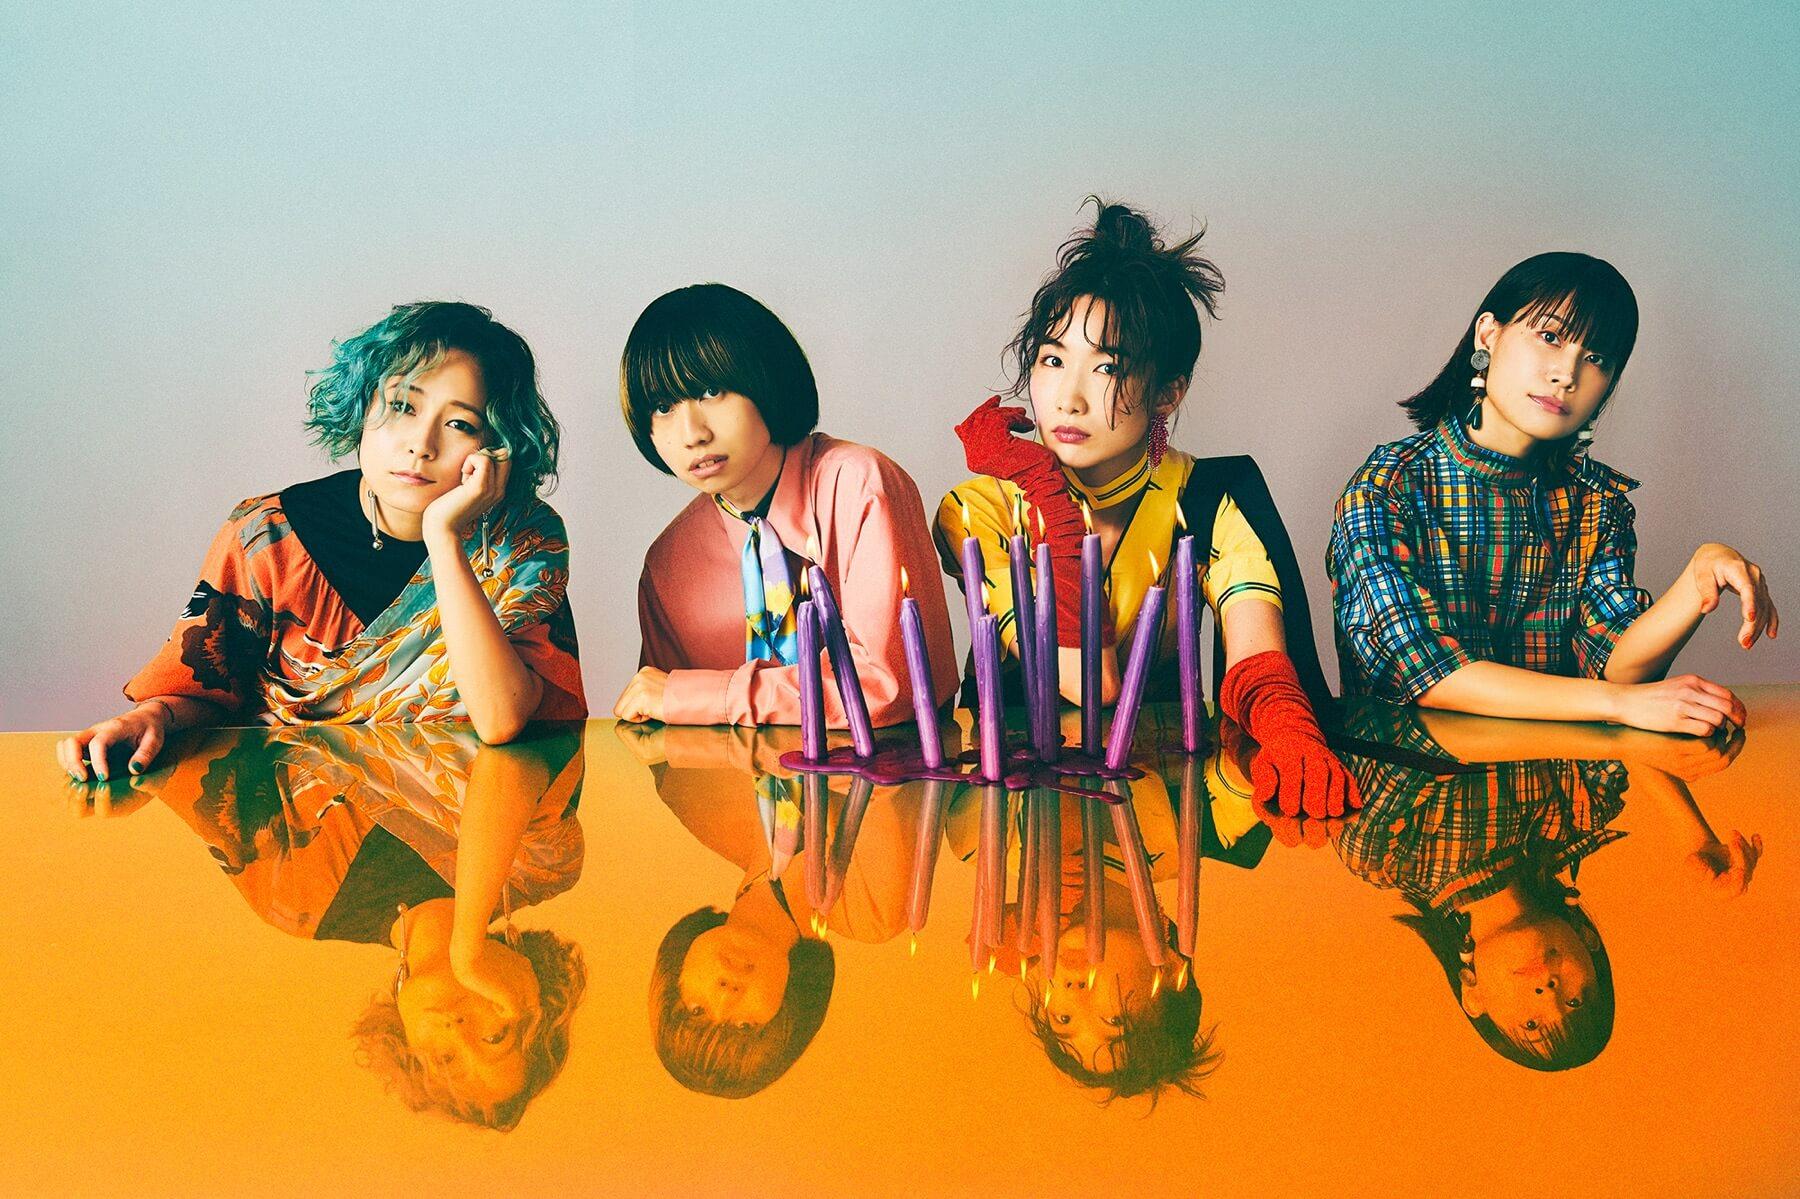 tricotの対バン企画「爆祭2020(-Vol.13-)」大阪編のゲスト出演者がACIDMAN、アルカラに決定